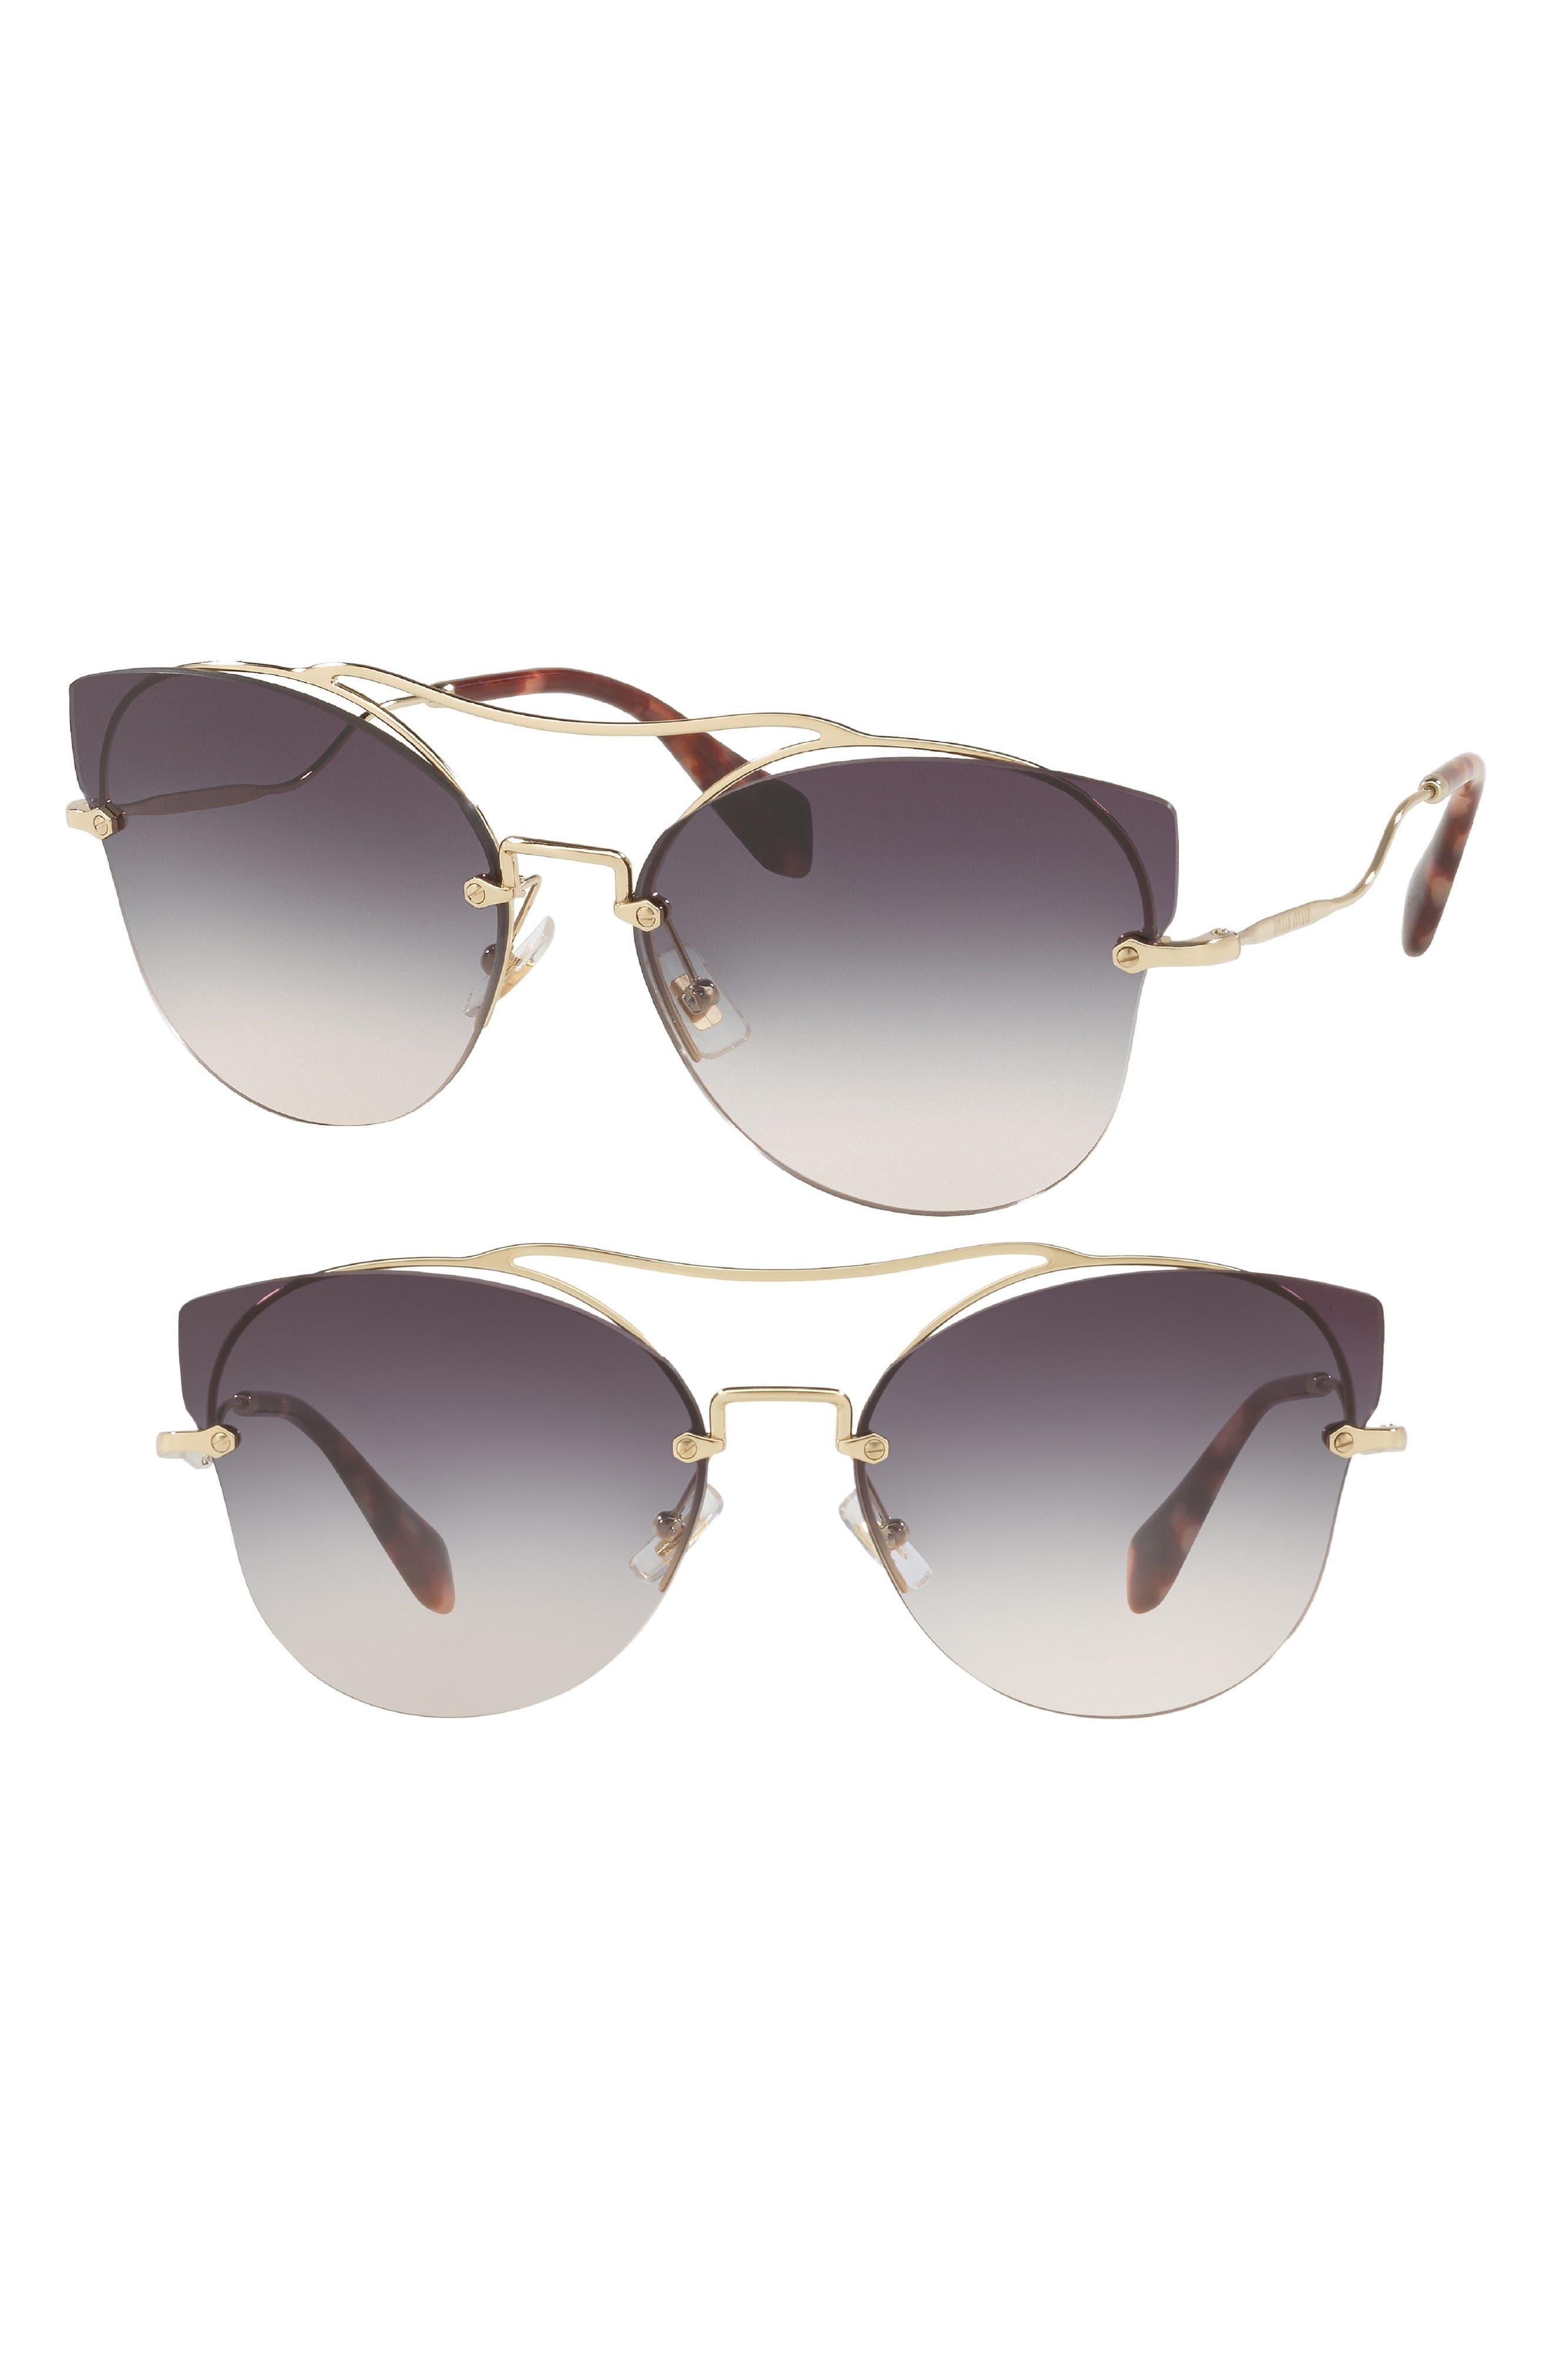 62mm Aviator Sunglasses,                             Main thumbnail 1, color,                             BLUE